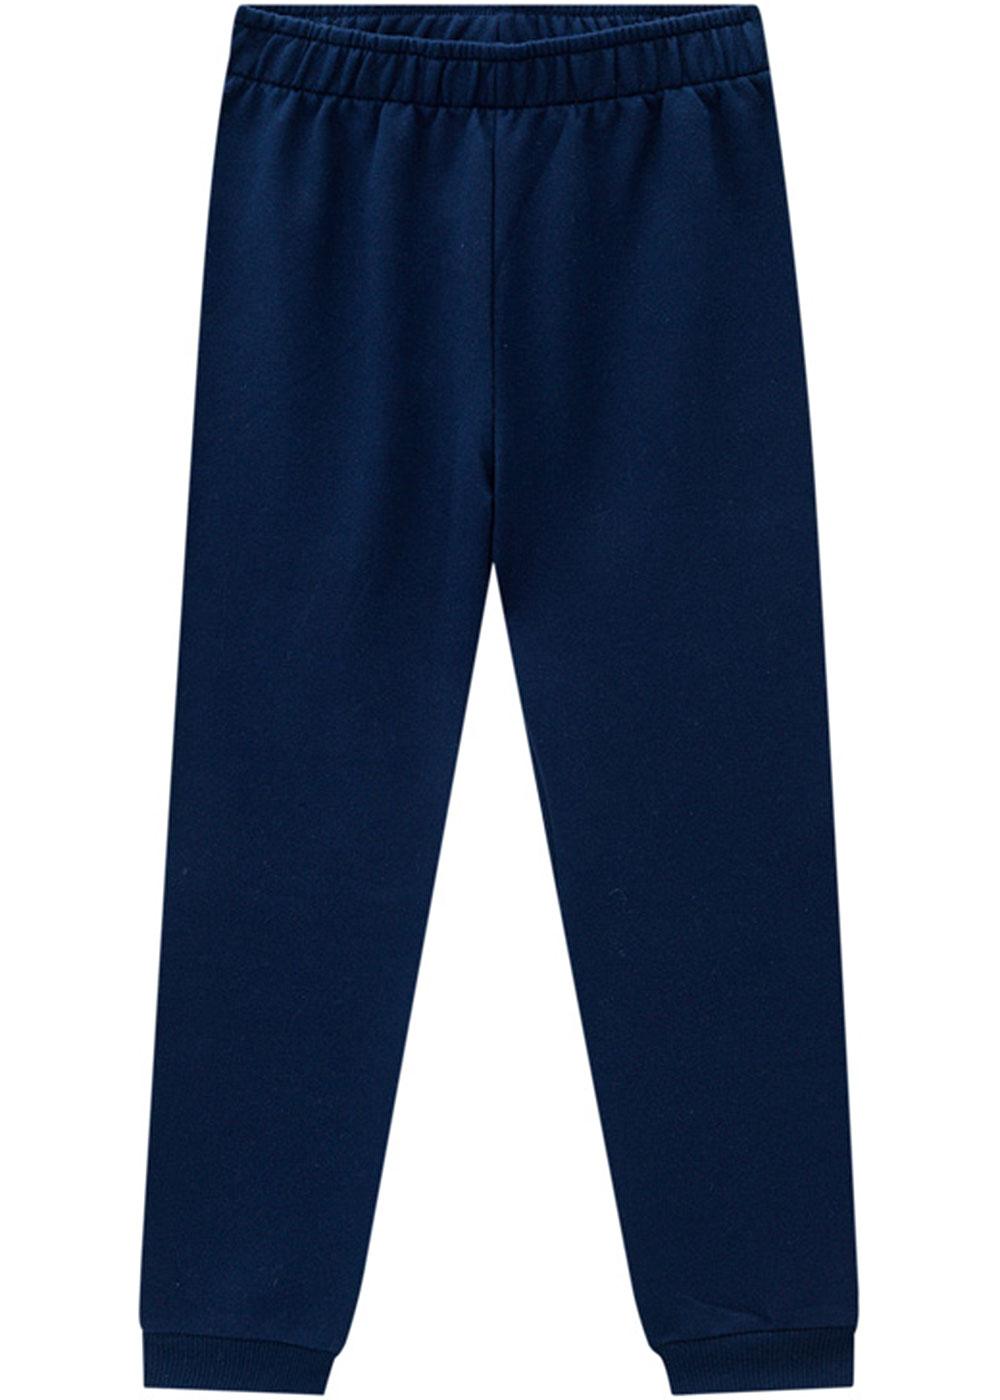 Conjunto Infantil Masculino Azul Inverno Hard Kyly